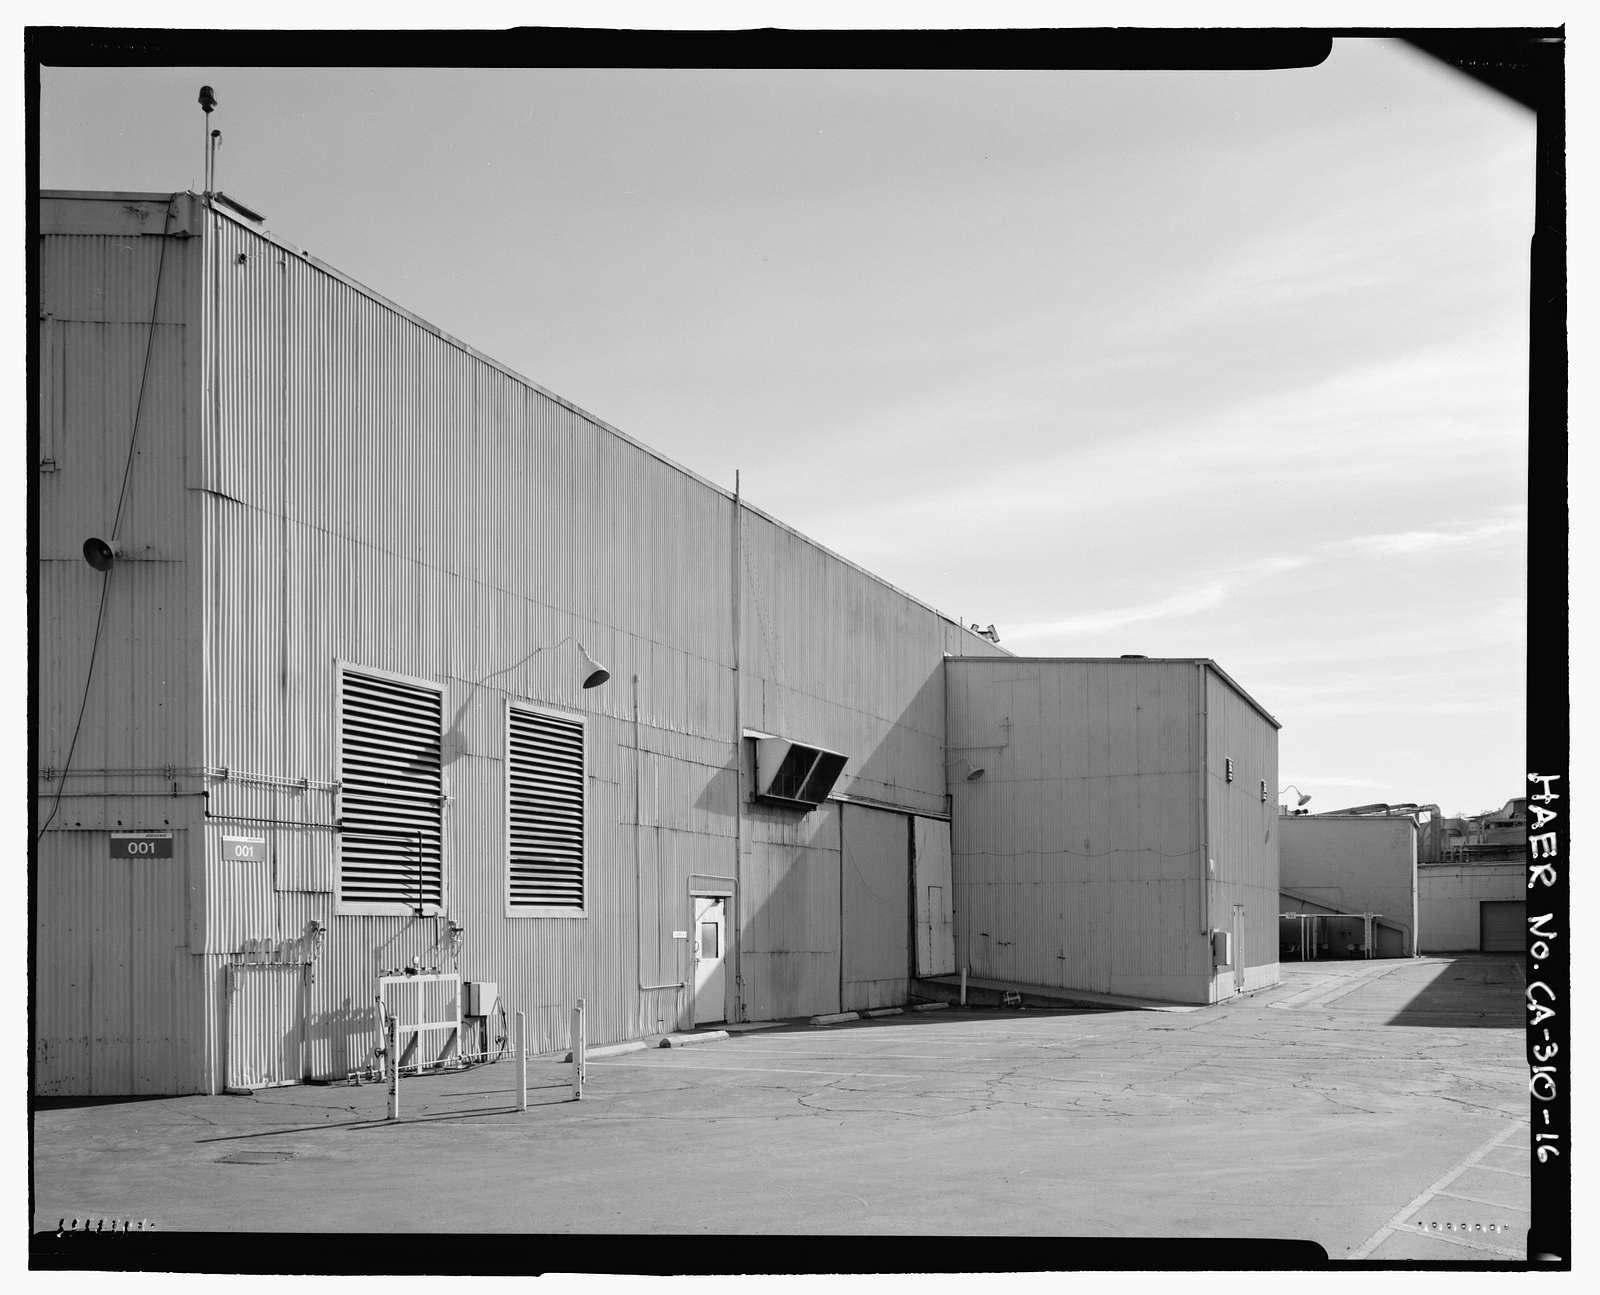 NASA Industrial Plant, 12214 Lakewood Boulevard, Downey, Los Angeles County, CA